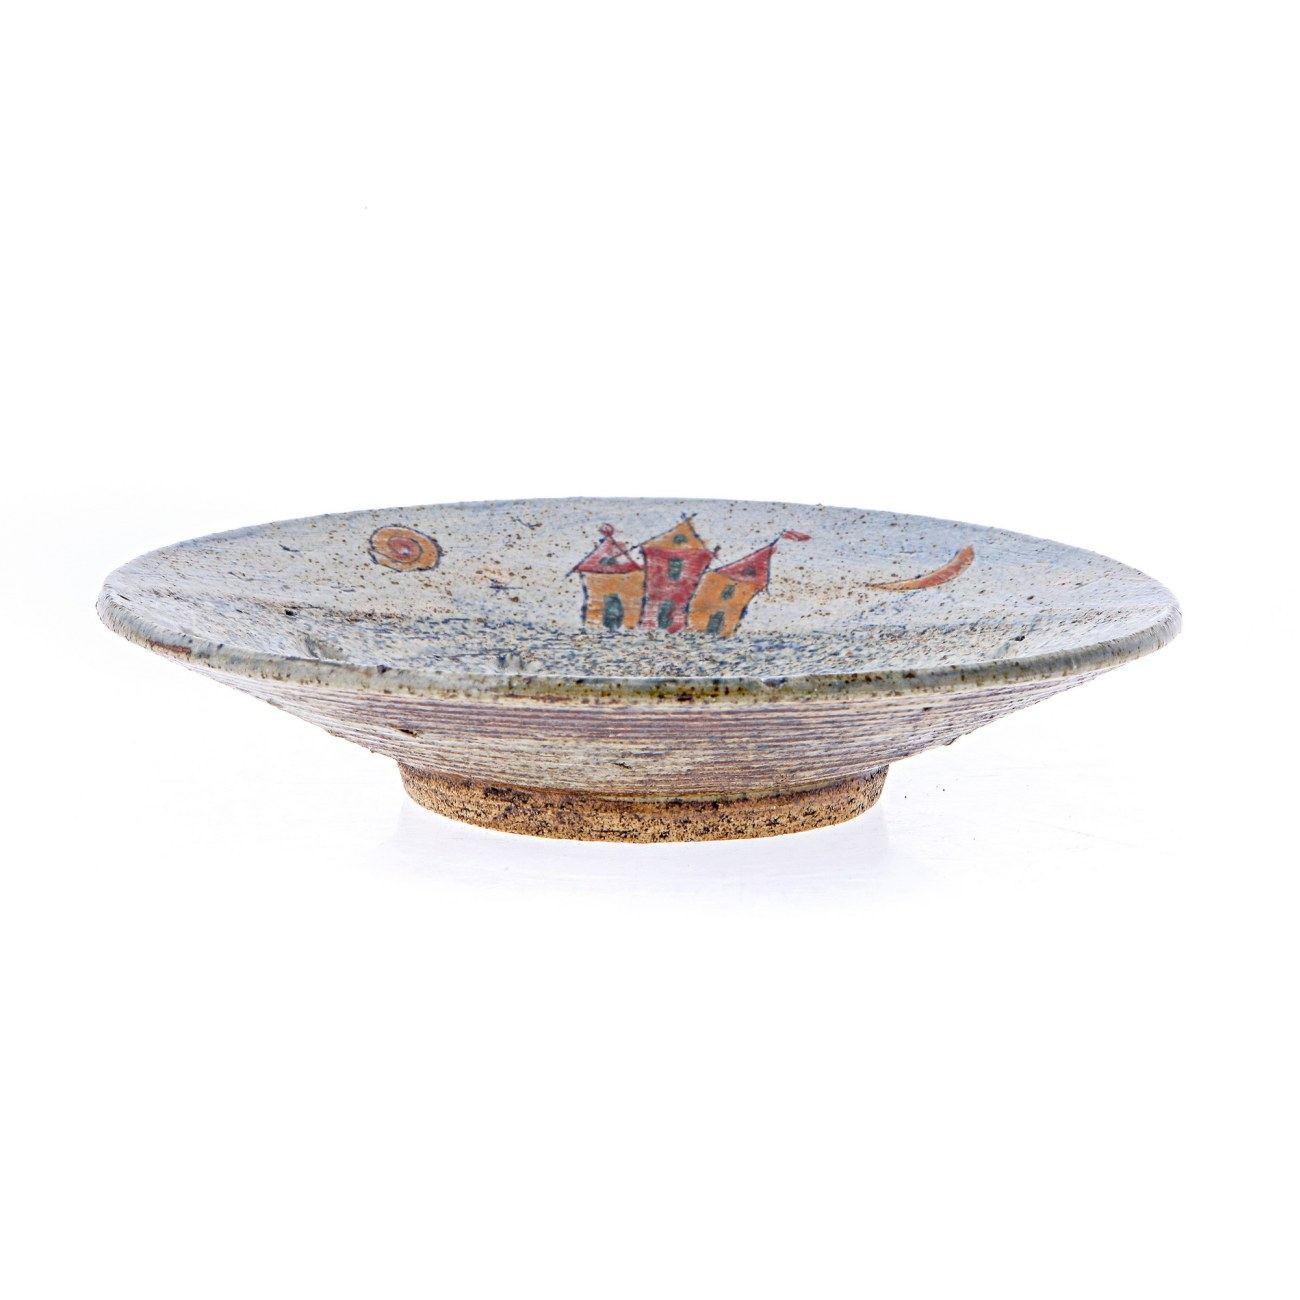 Decorative Plate Handmade Ceramic Table Or Wall Art Decor House Design 36cm 14 2